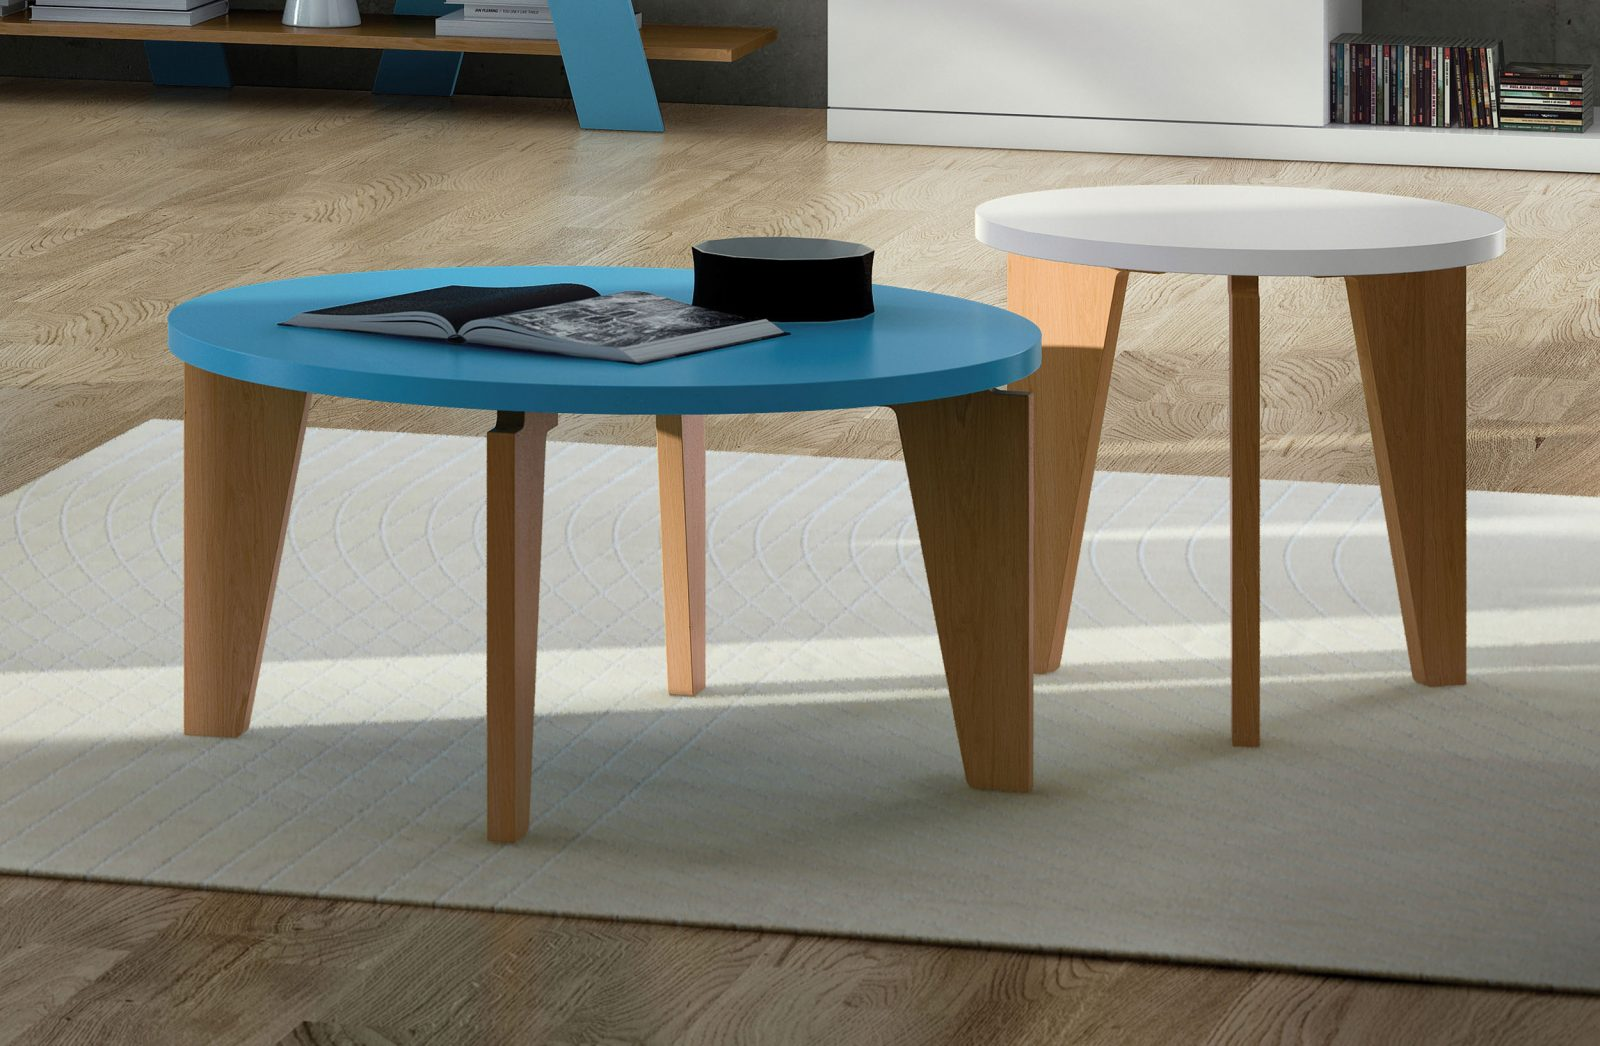 salon avec deux tables basses rondes. Black Bedroom Furniture Sets. Home Design Ideas